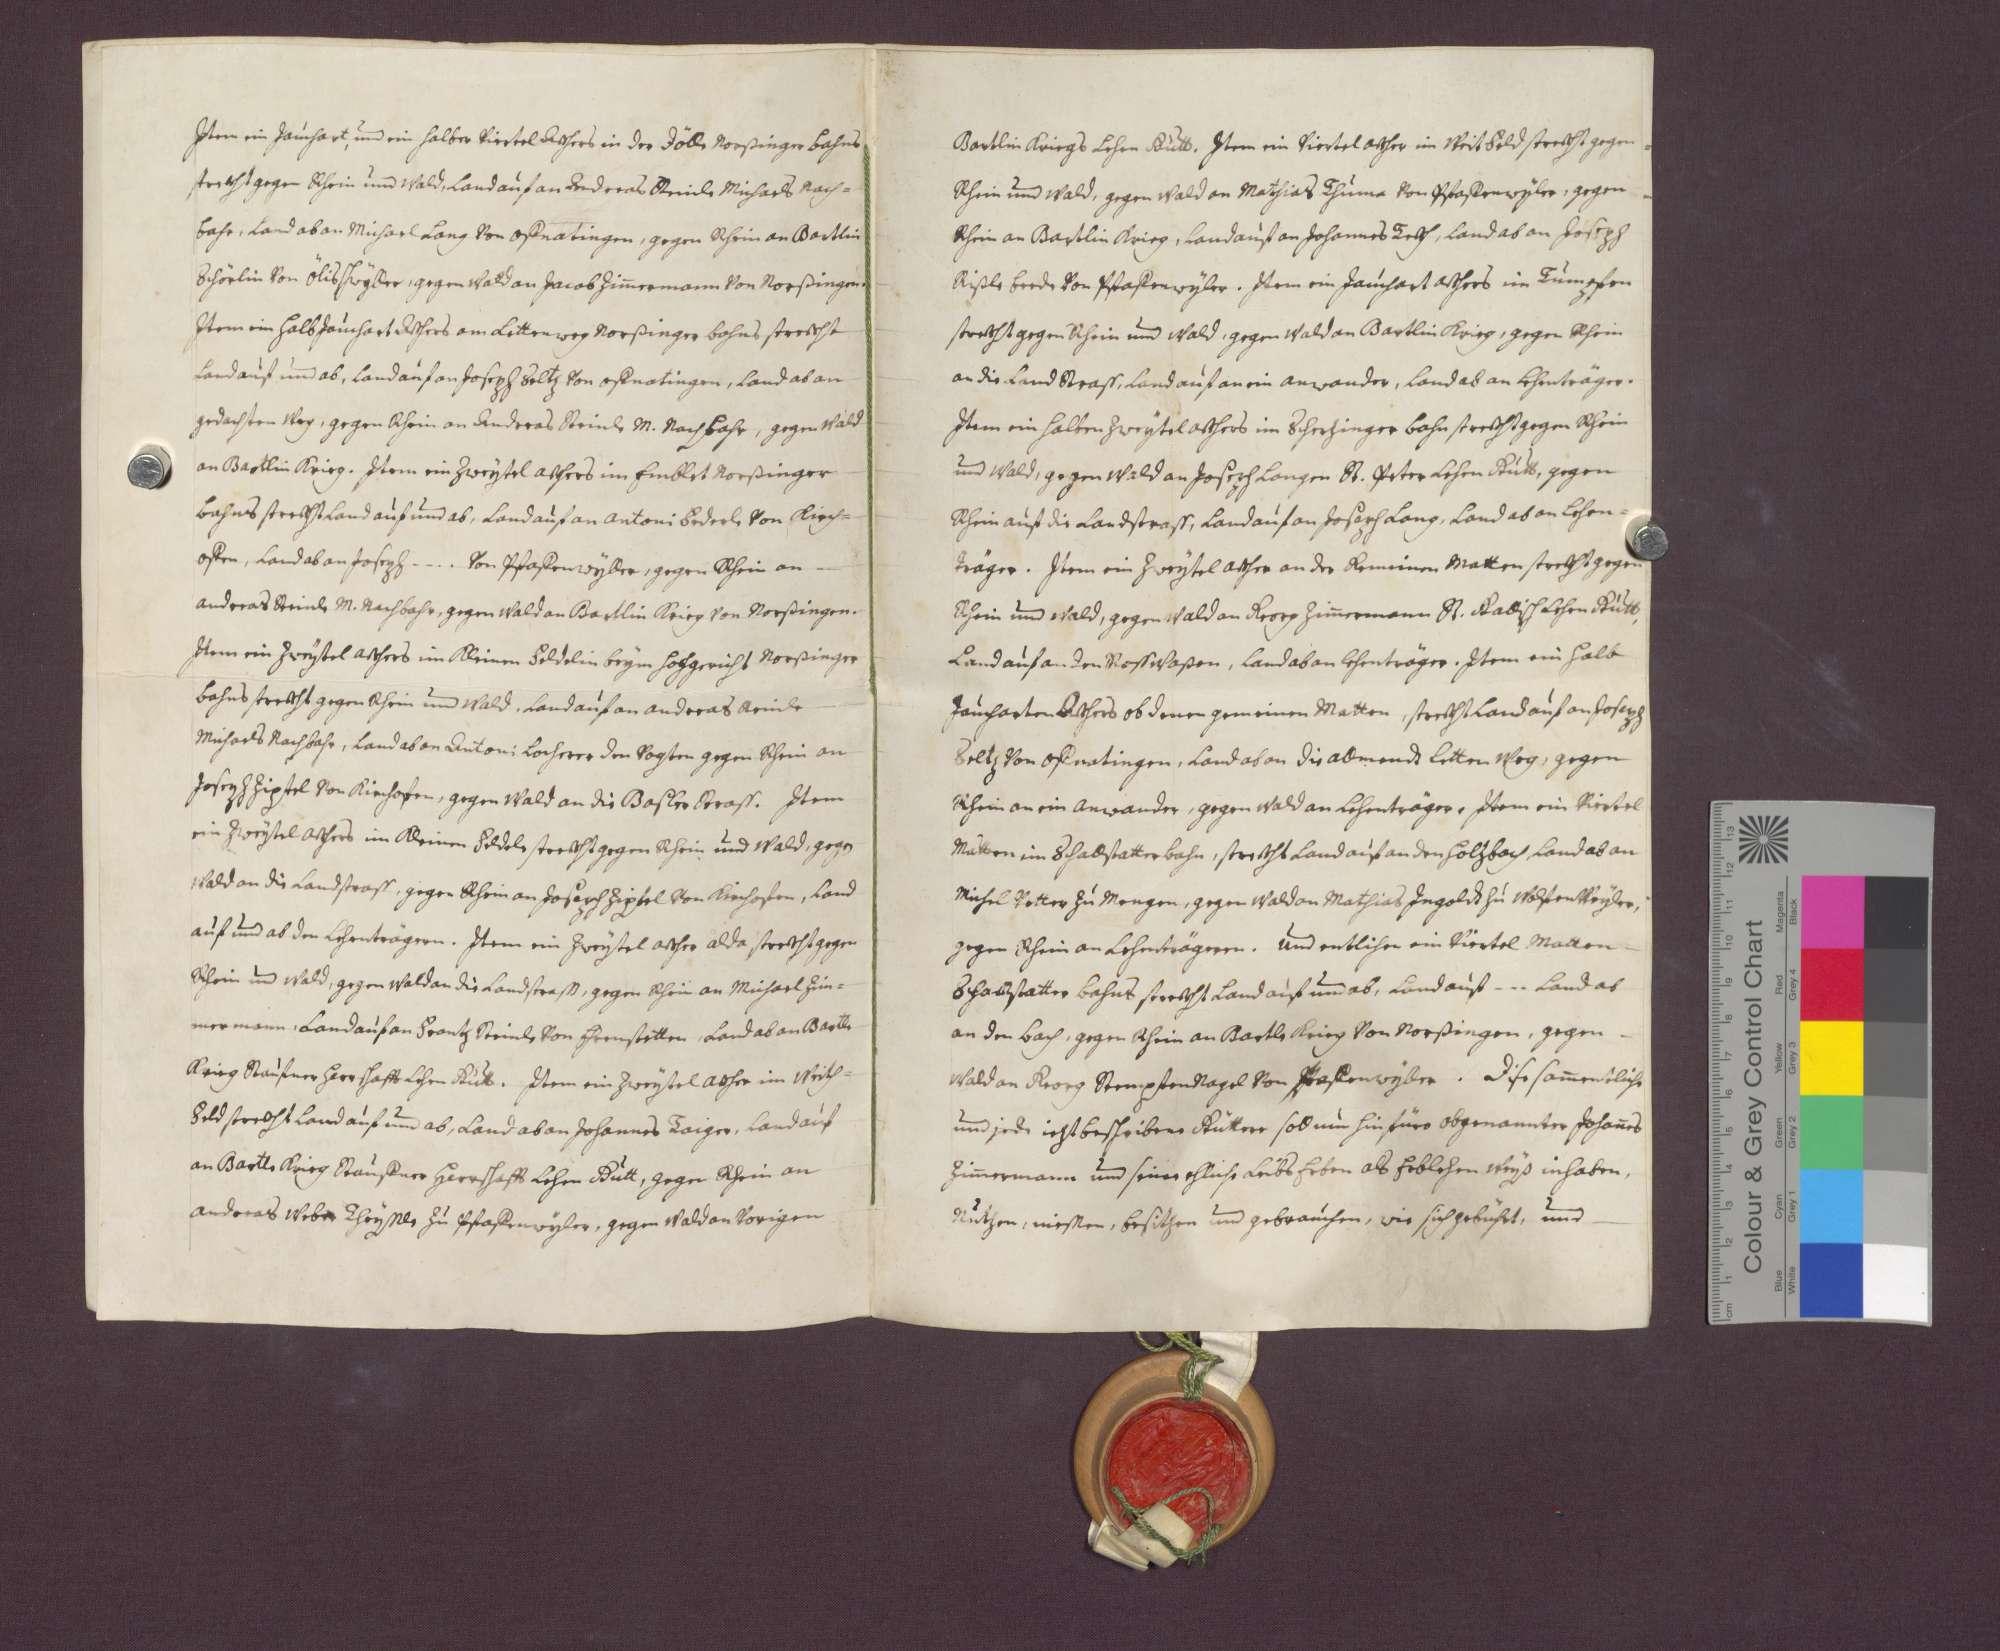 Lehnrevers des Johannes Zimmermann gegenüber dem Basler Domkapitel., Bild 3